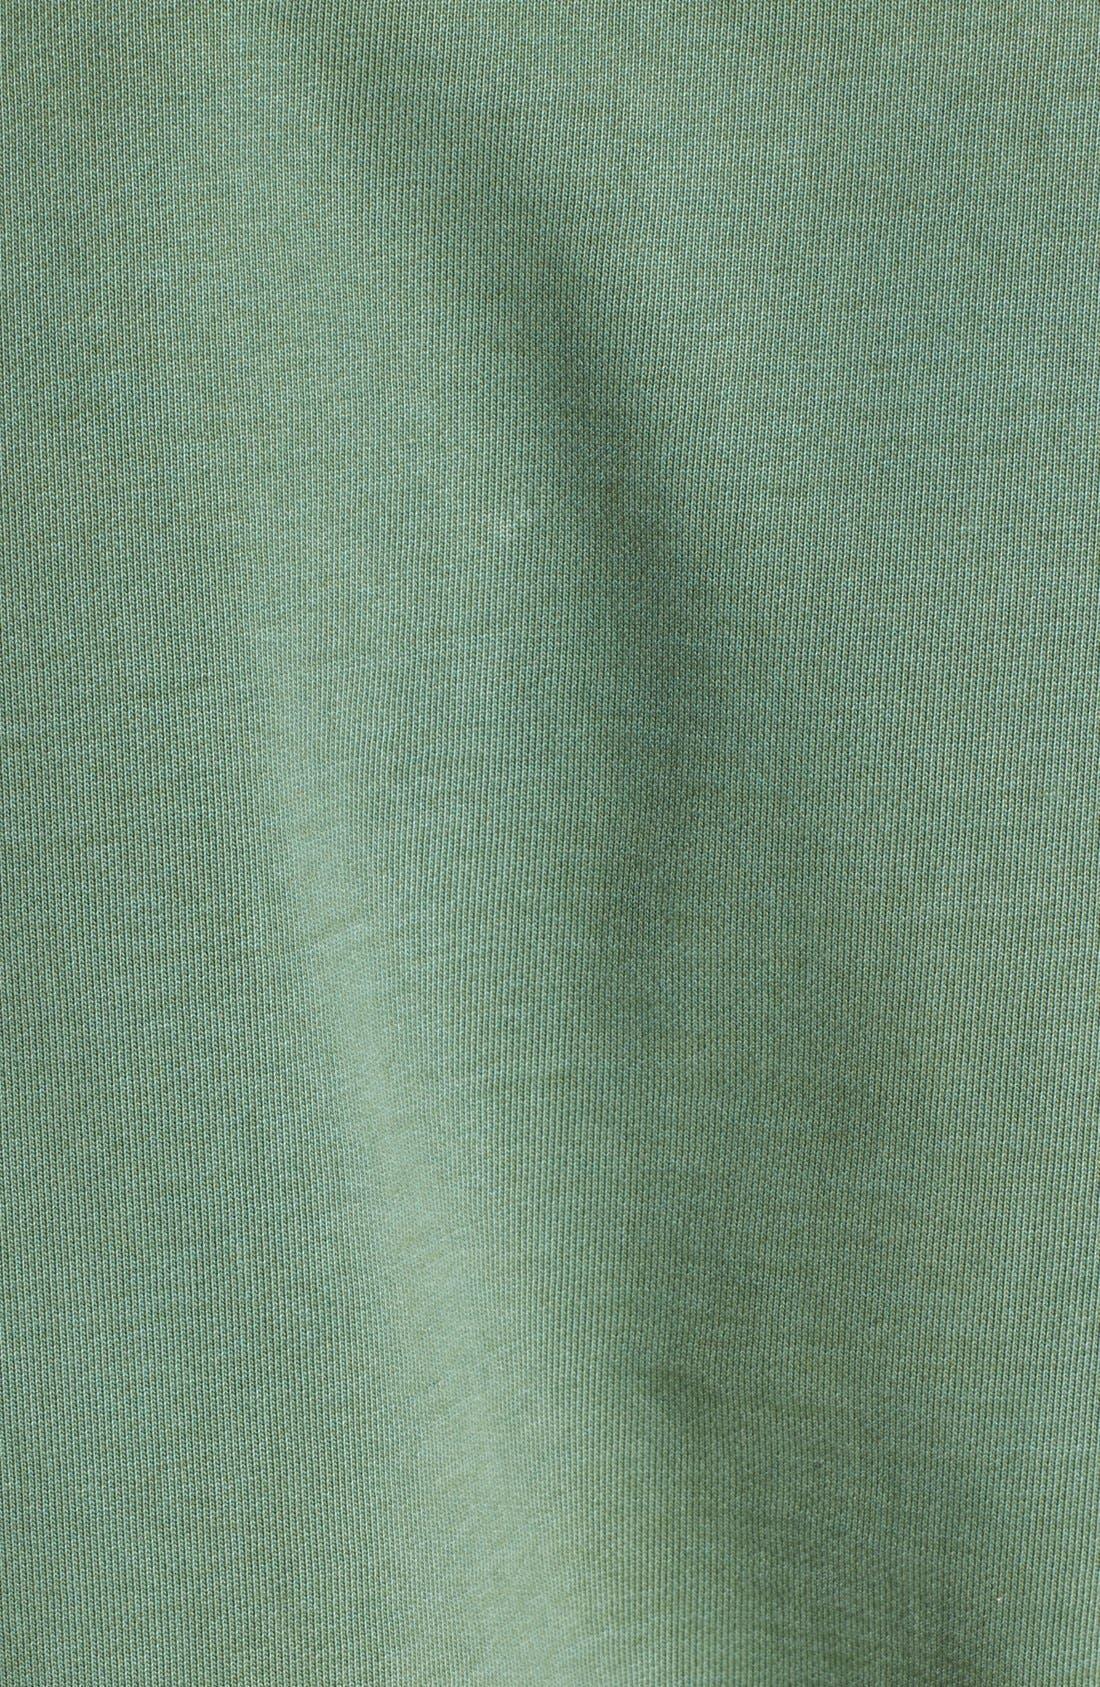 Alternate Image 3  - MARC BY MARC JACOBS Vintage Pocket Sweatshirt